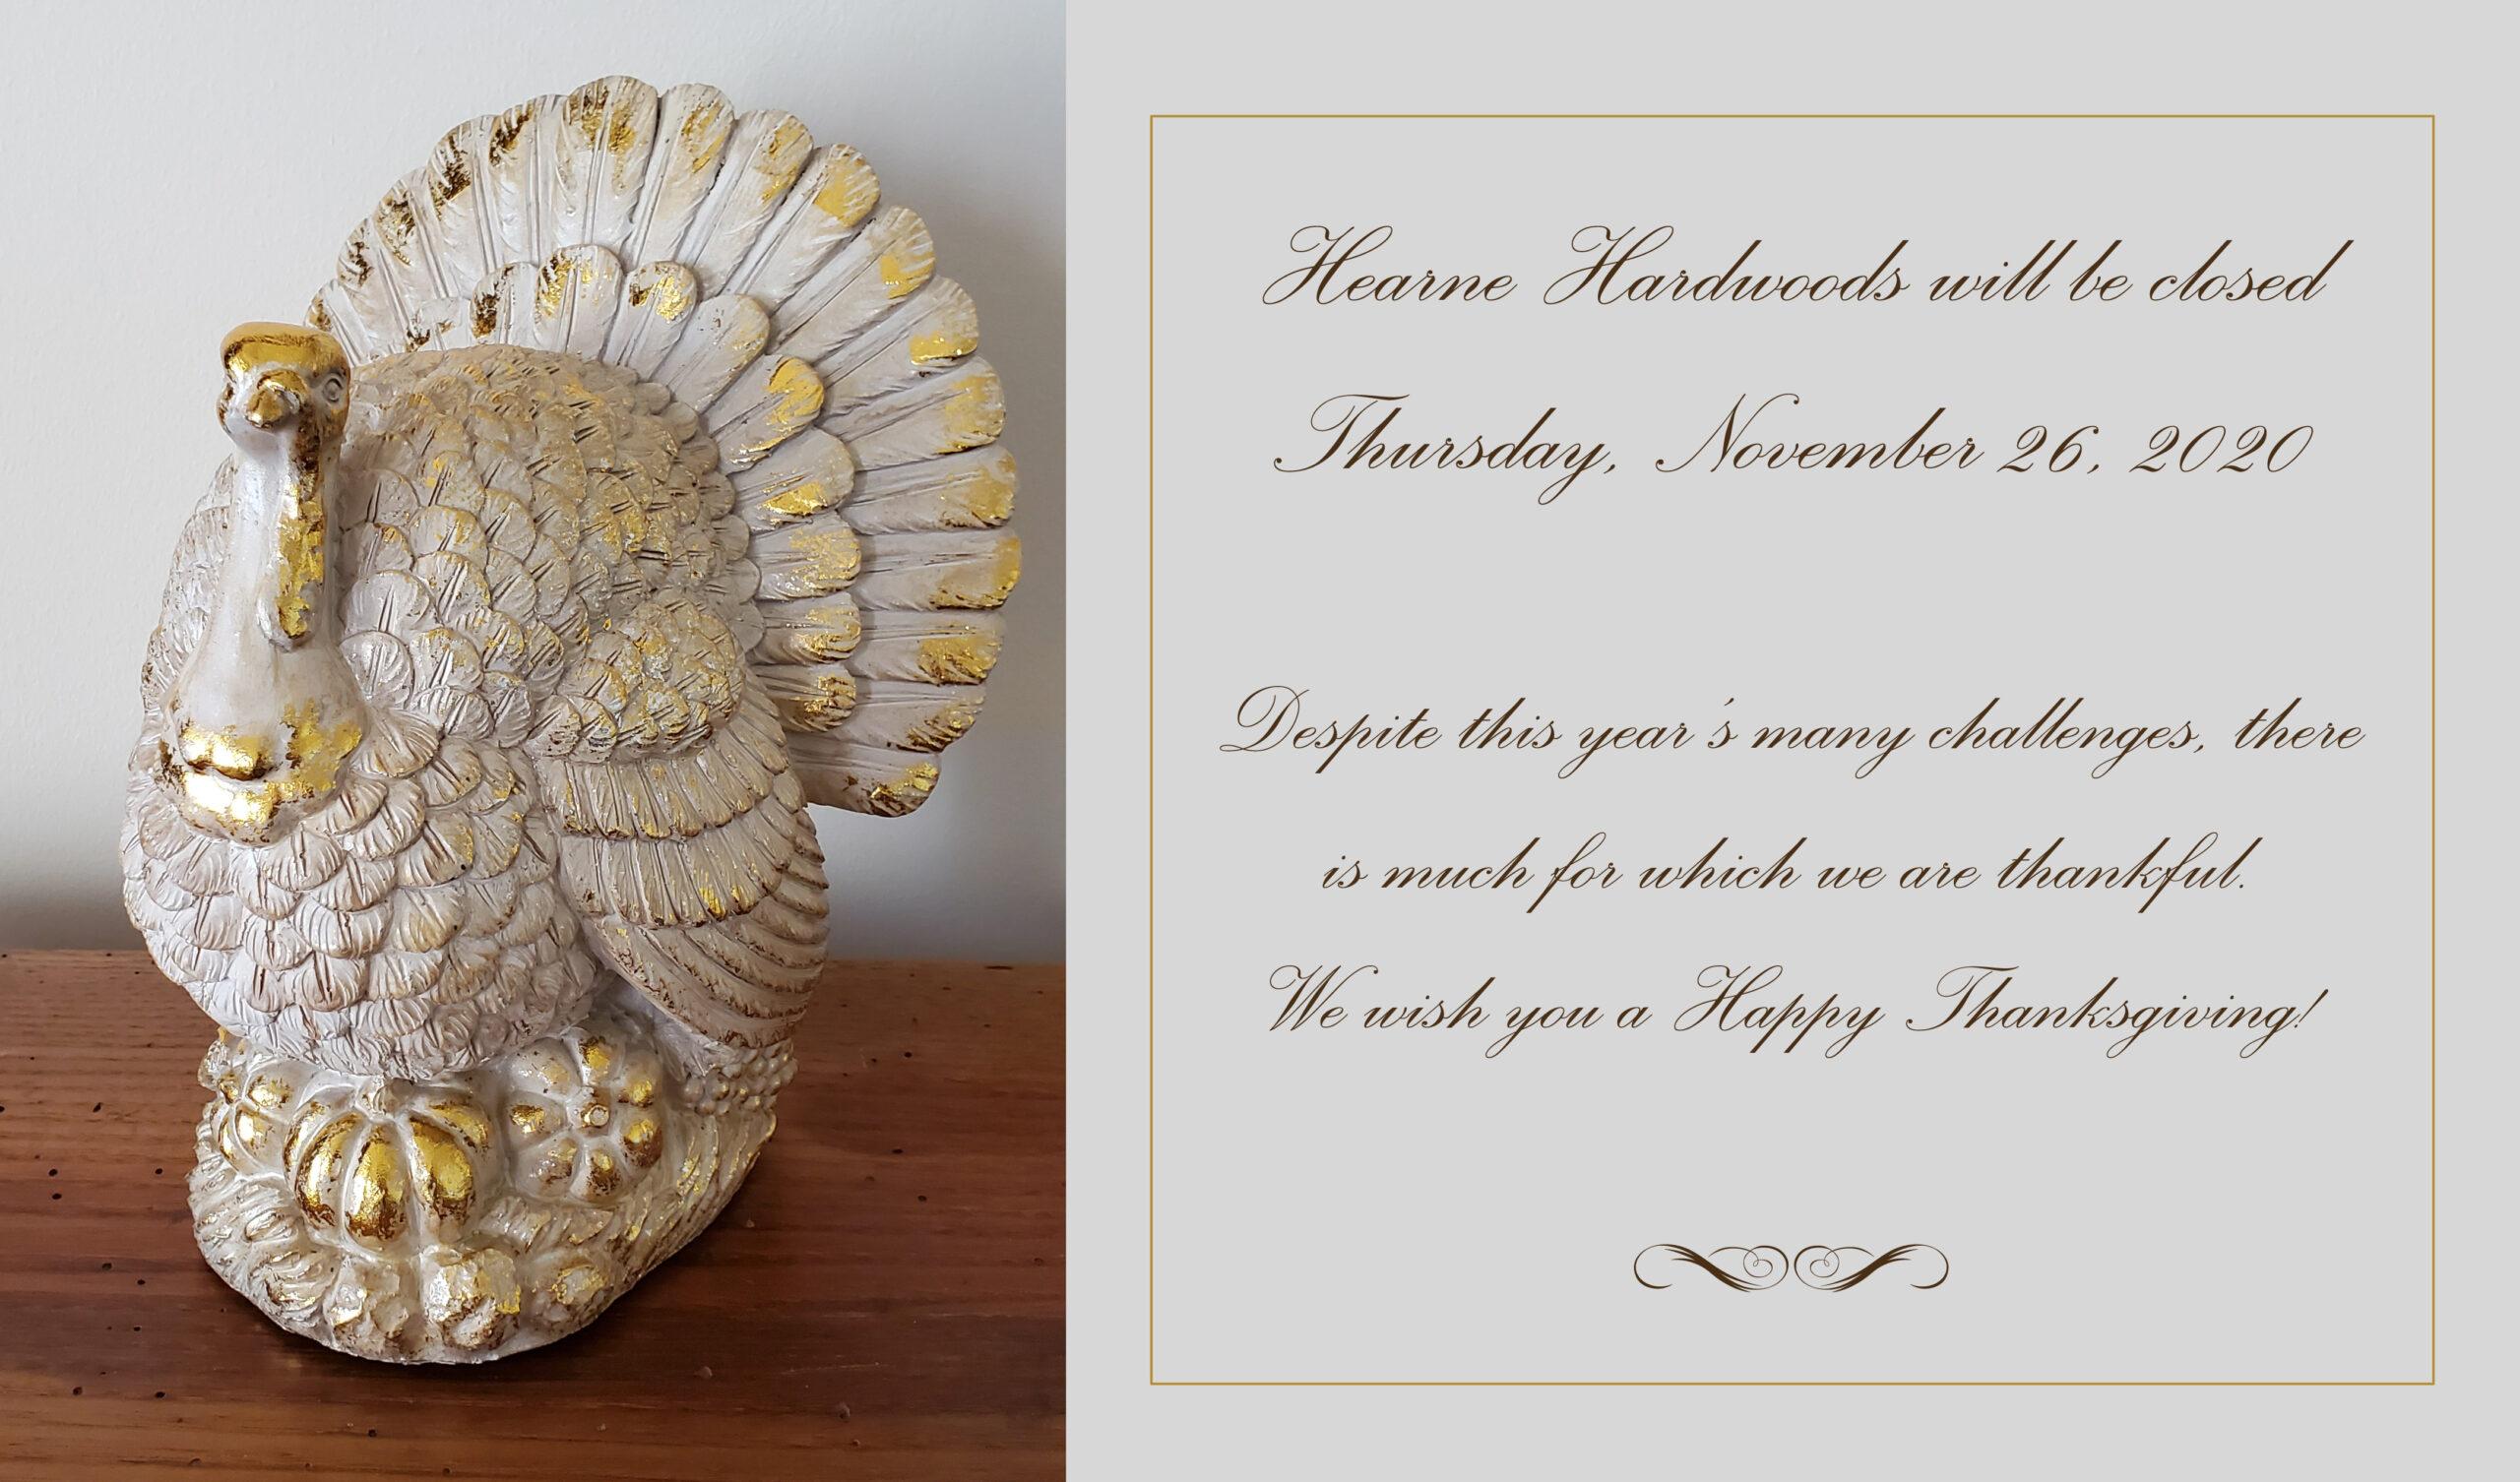 Hearne Hardwoods will be closed on Thursday November 26, 2020 - Happy Thanksgiving!